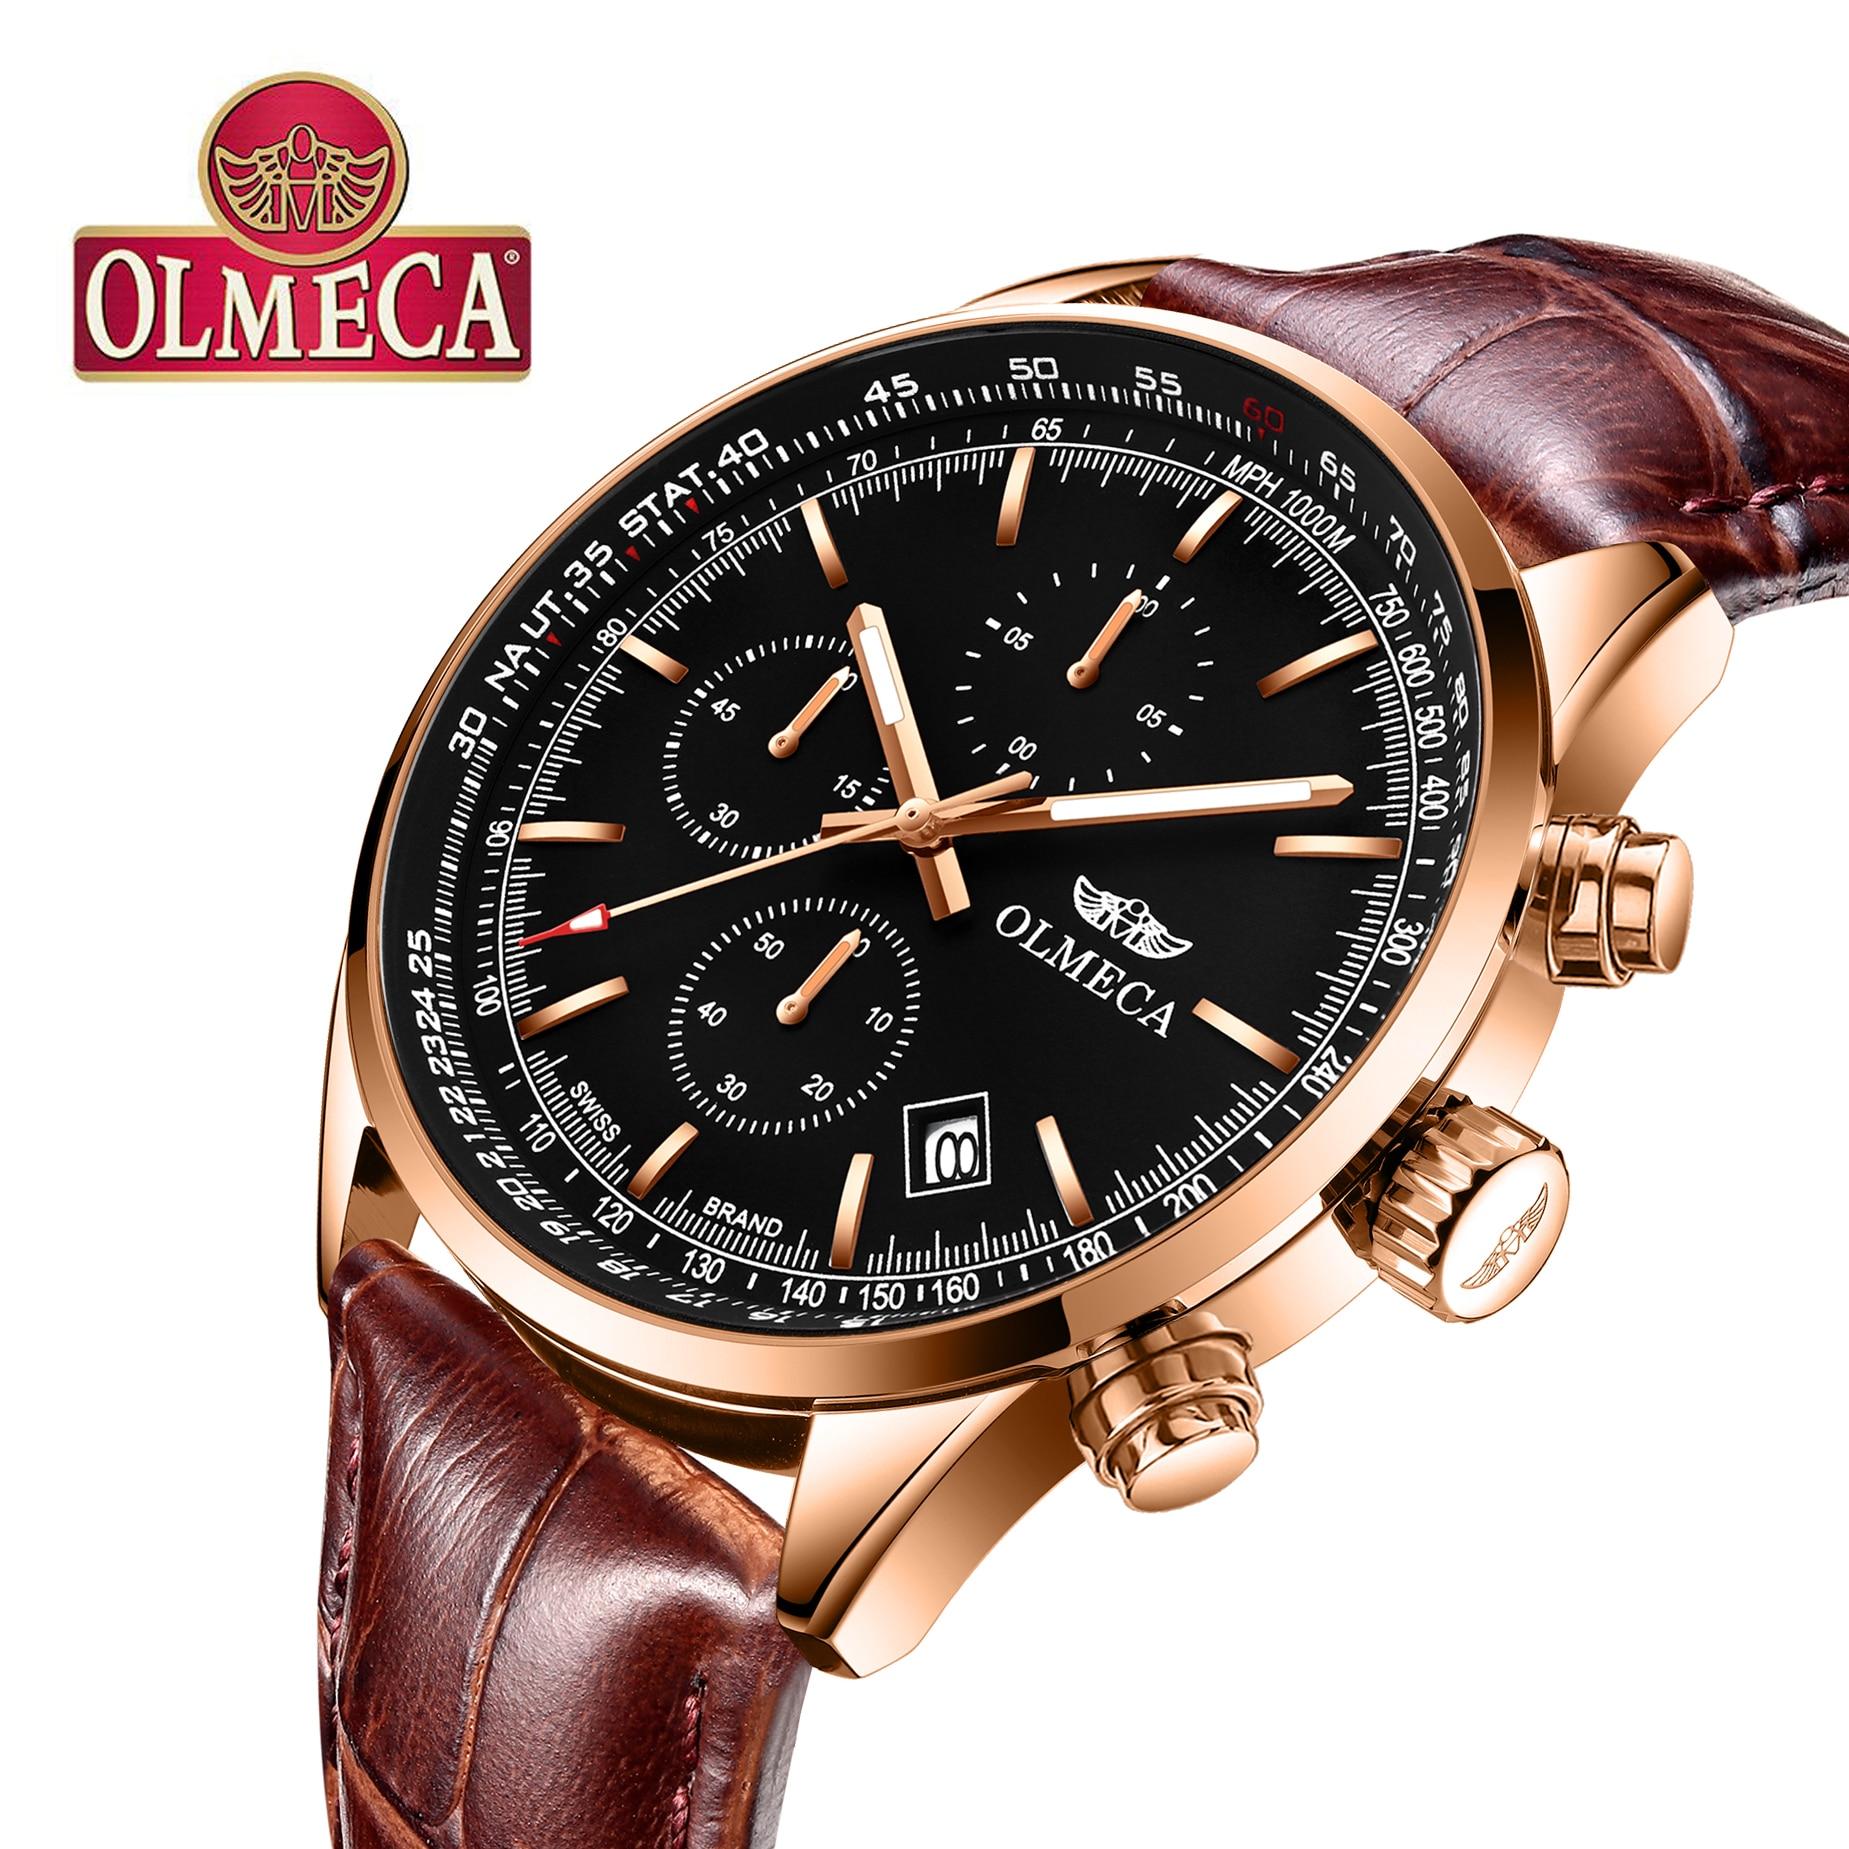 OLMECA Women Watch Luxury Fashion Dial Stainless Leather Wrist Quartz Watches Waterproof Business Health Watch Reloj de mujer